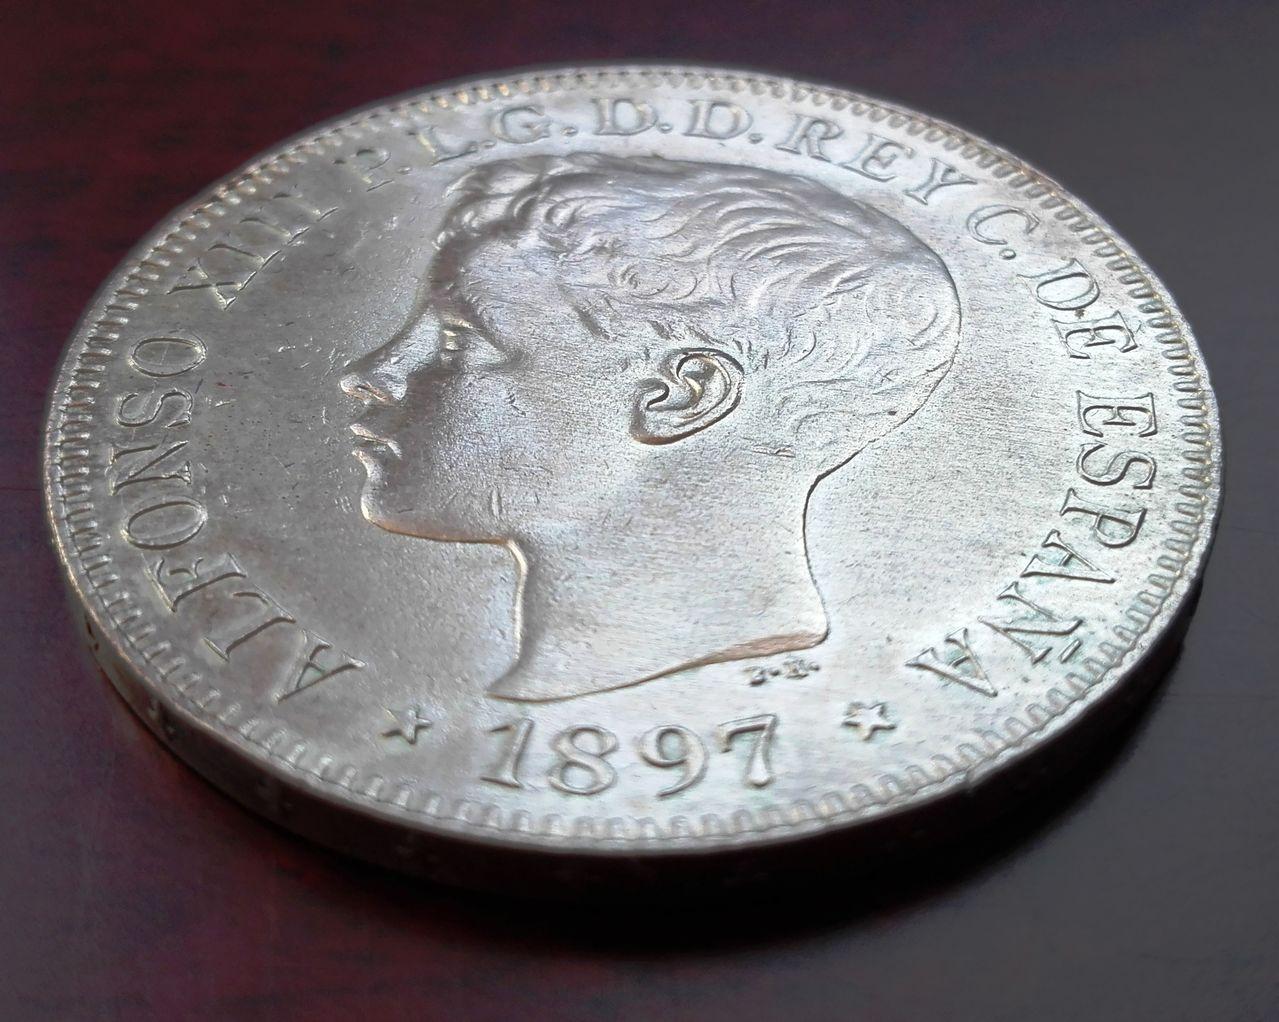 1 peso Filipinas 1897, Alfonso XIII  1_peso_fiolipnas_2